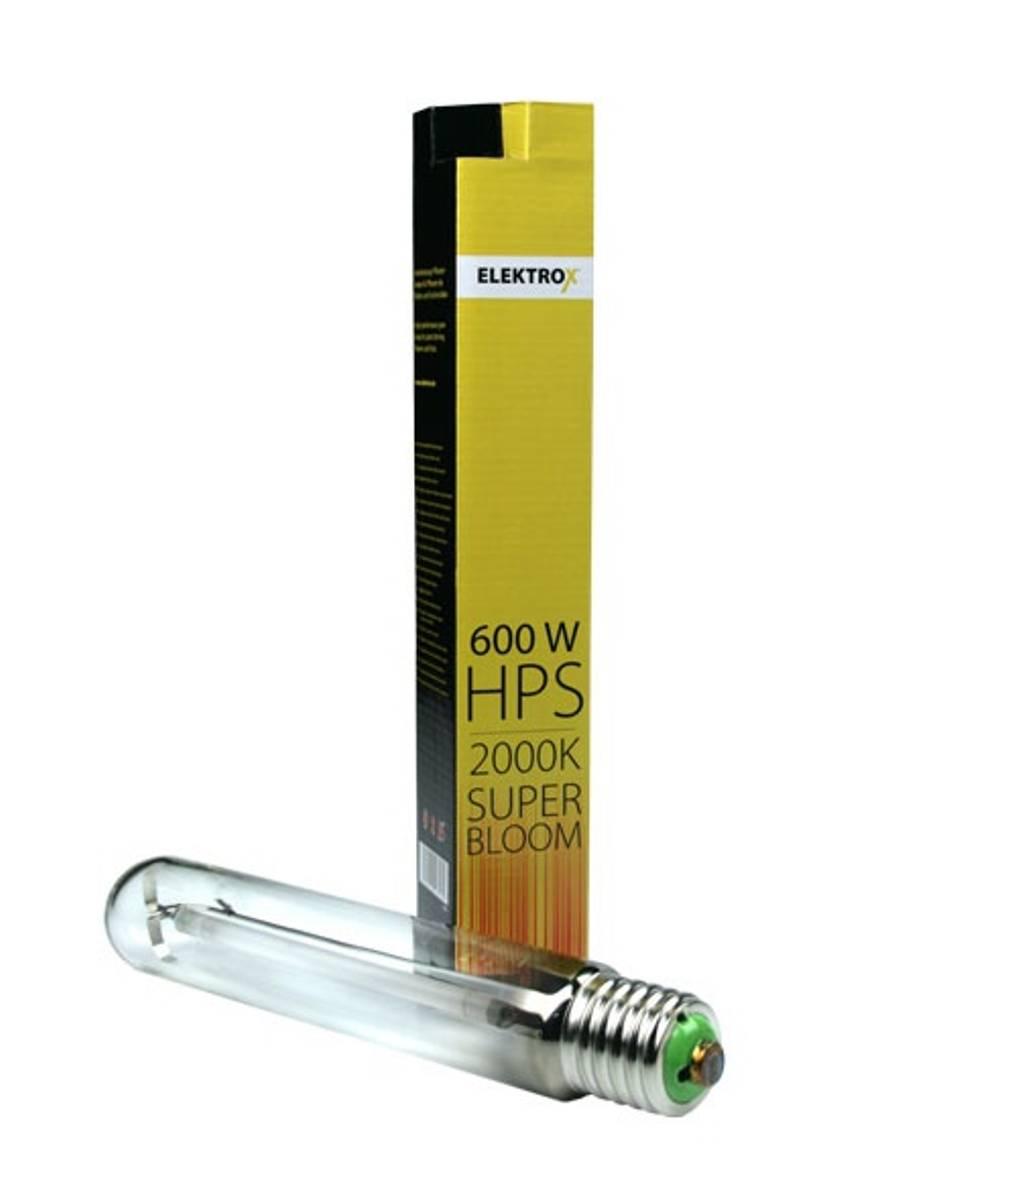 Elektrox 600 W HPS Super Bloom